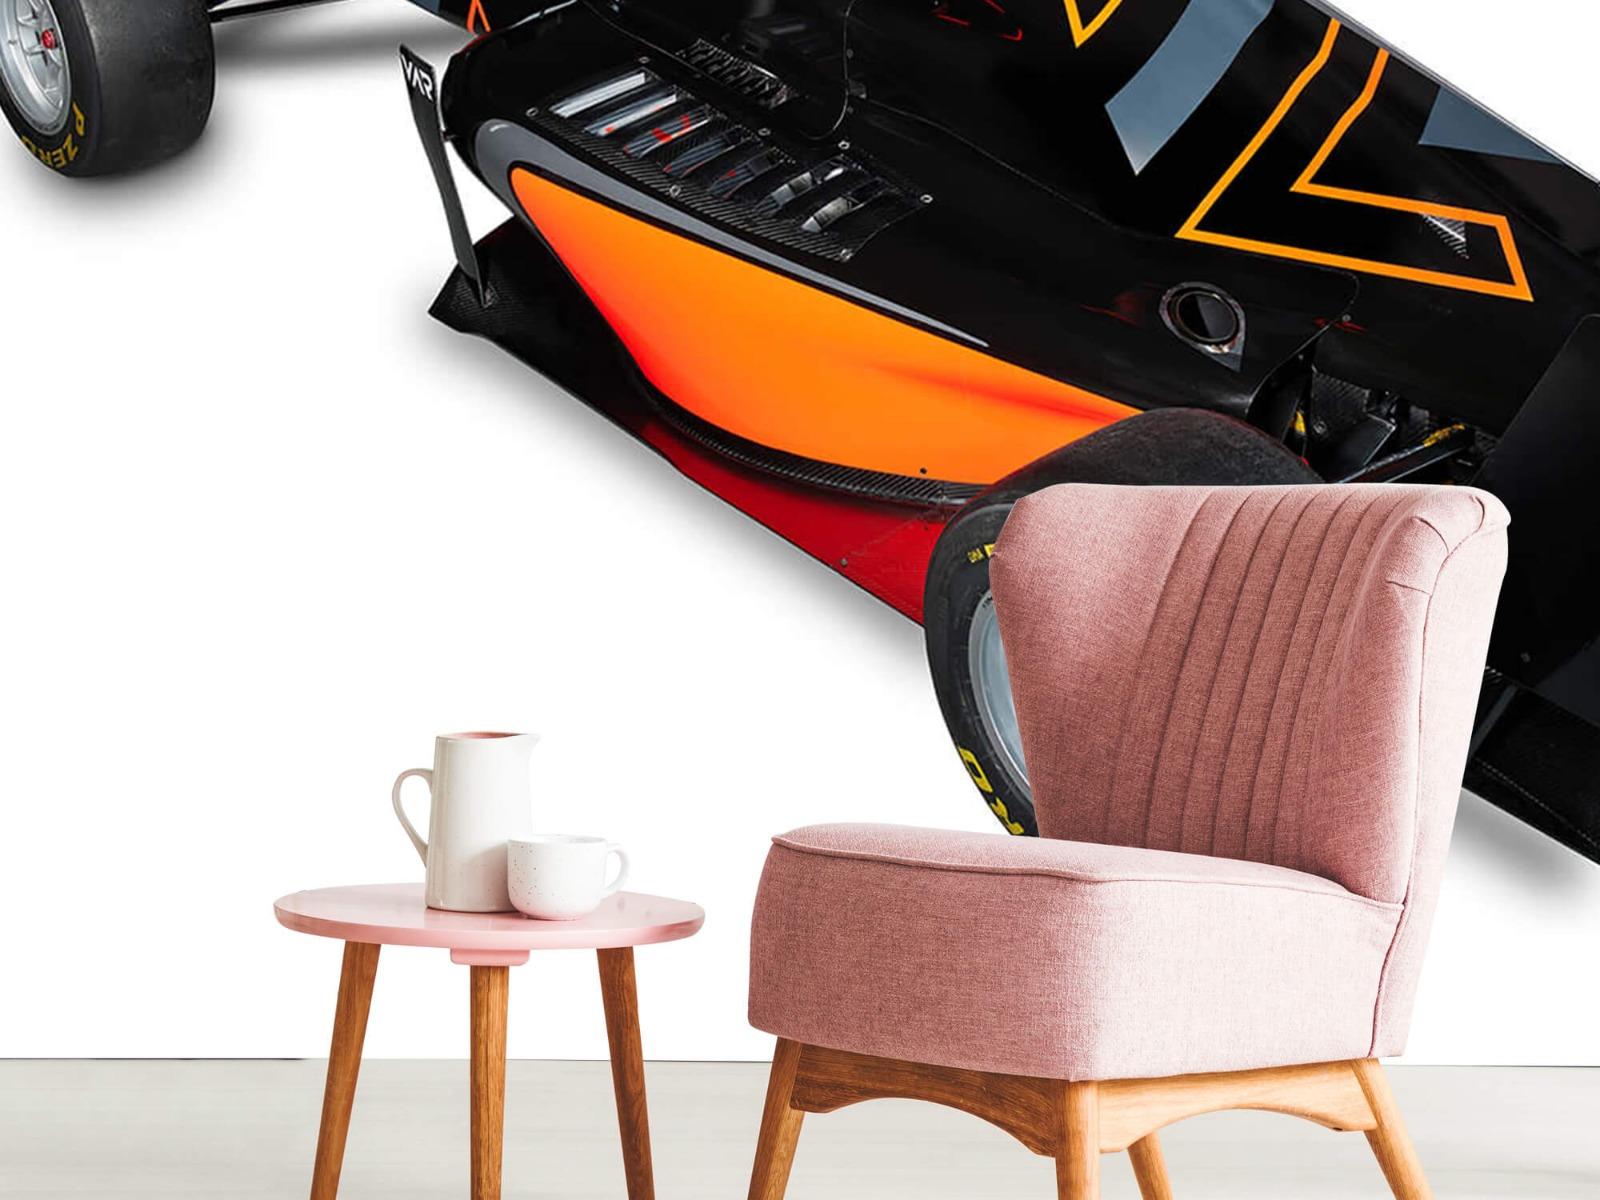 Sportauto's - Formula 3 - Rear left view - Hobbykamer 9